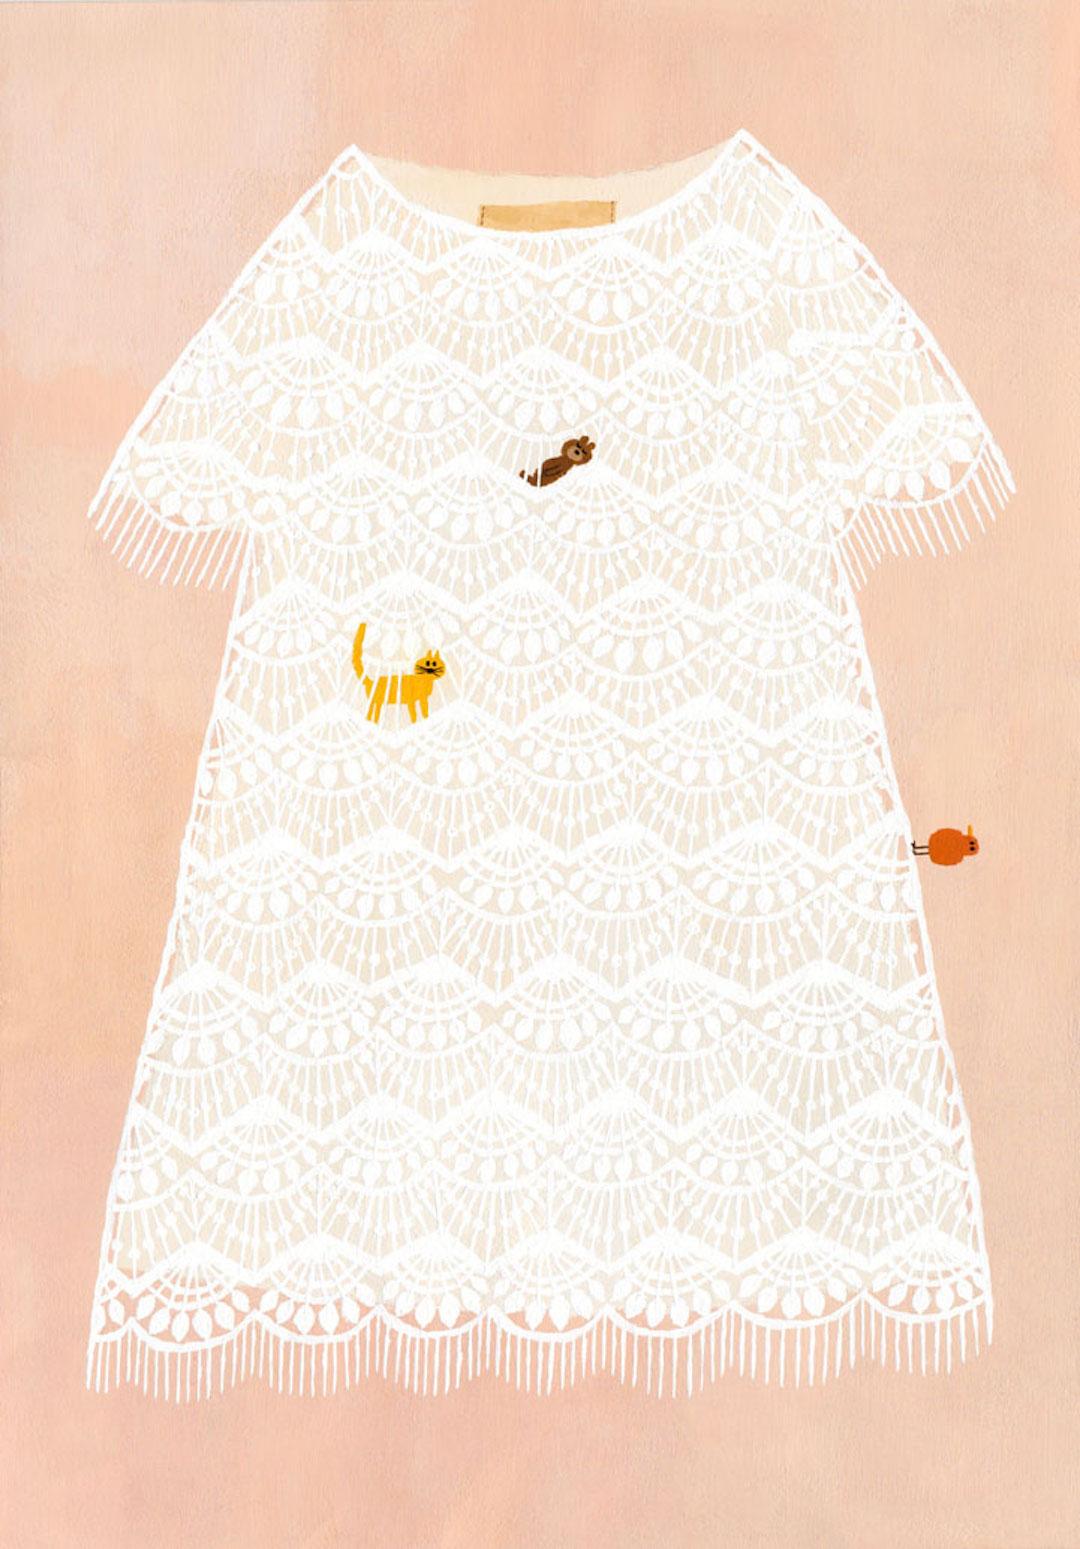 Pink illustration by Kaori Seno